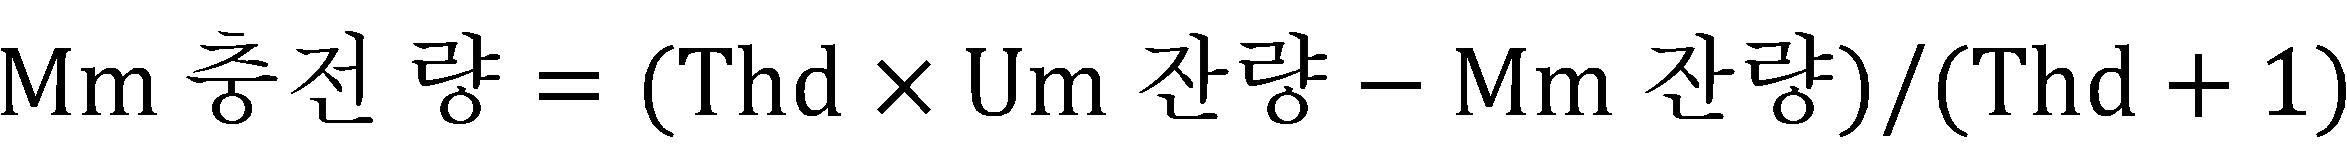 Figure 112013018841538-pat00016